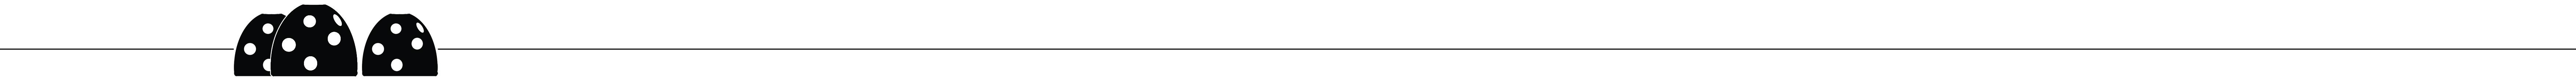 RBF_Divider-B-W3_Long